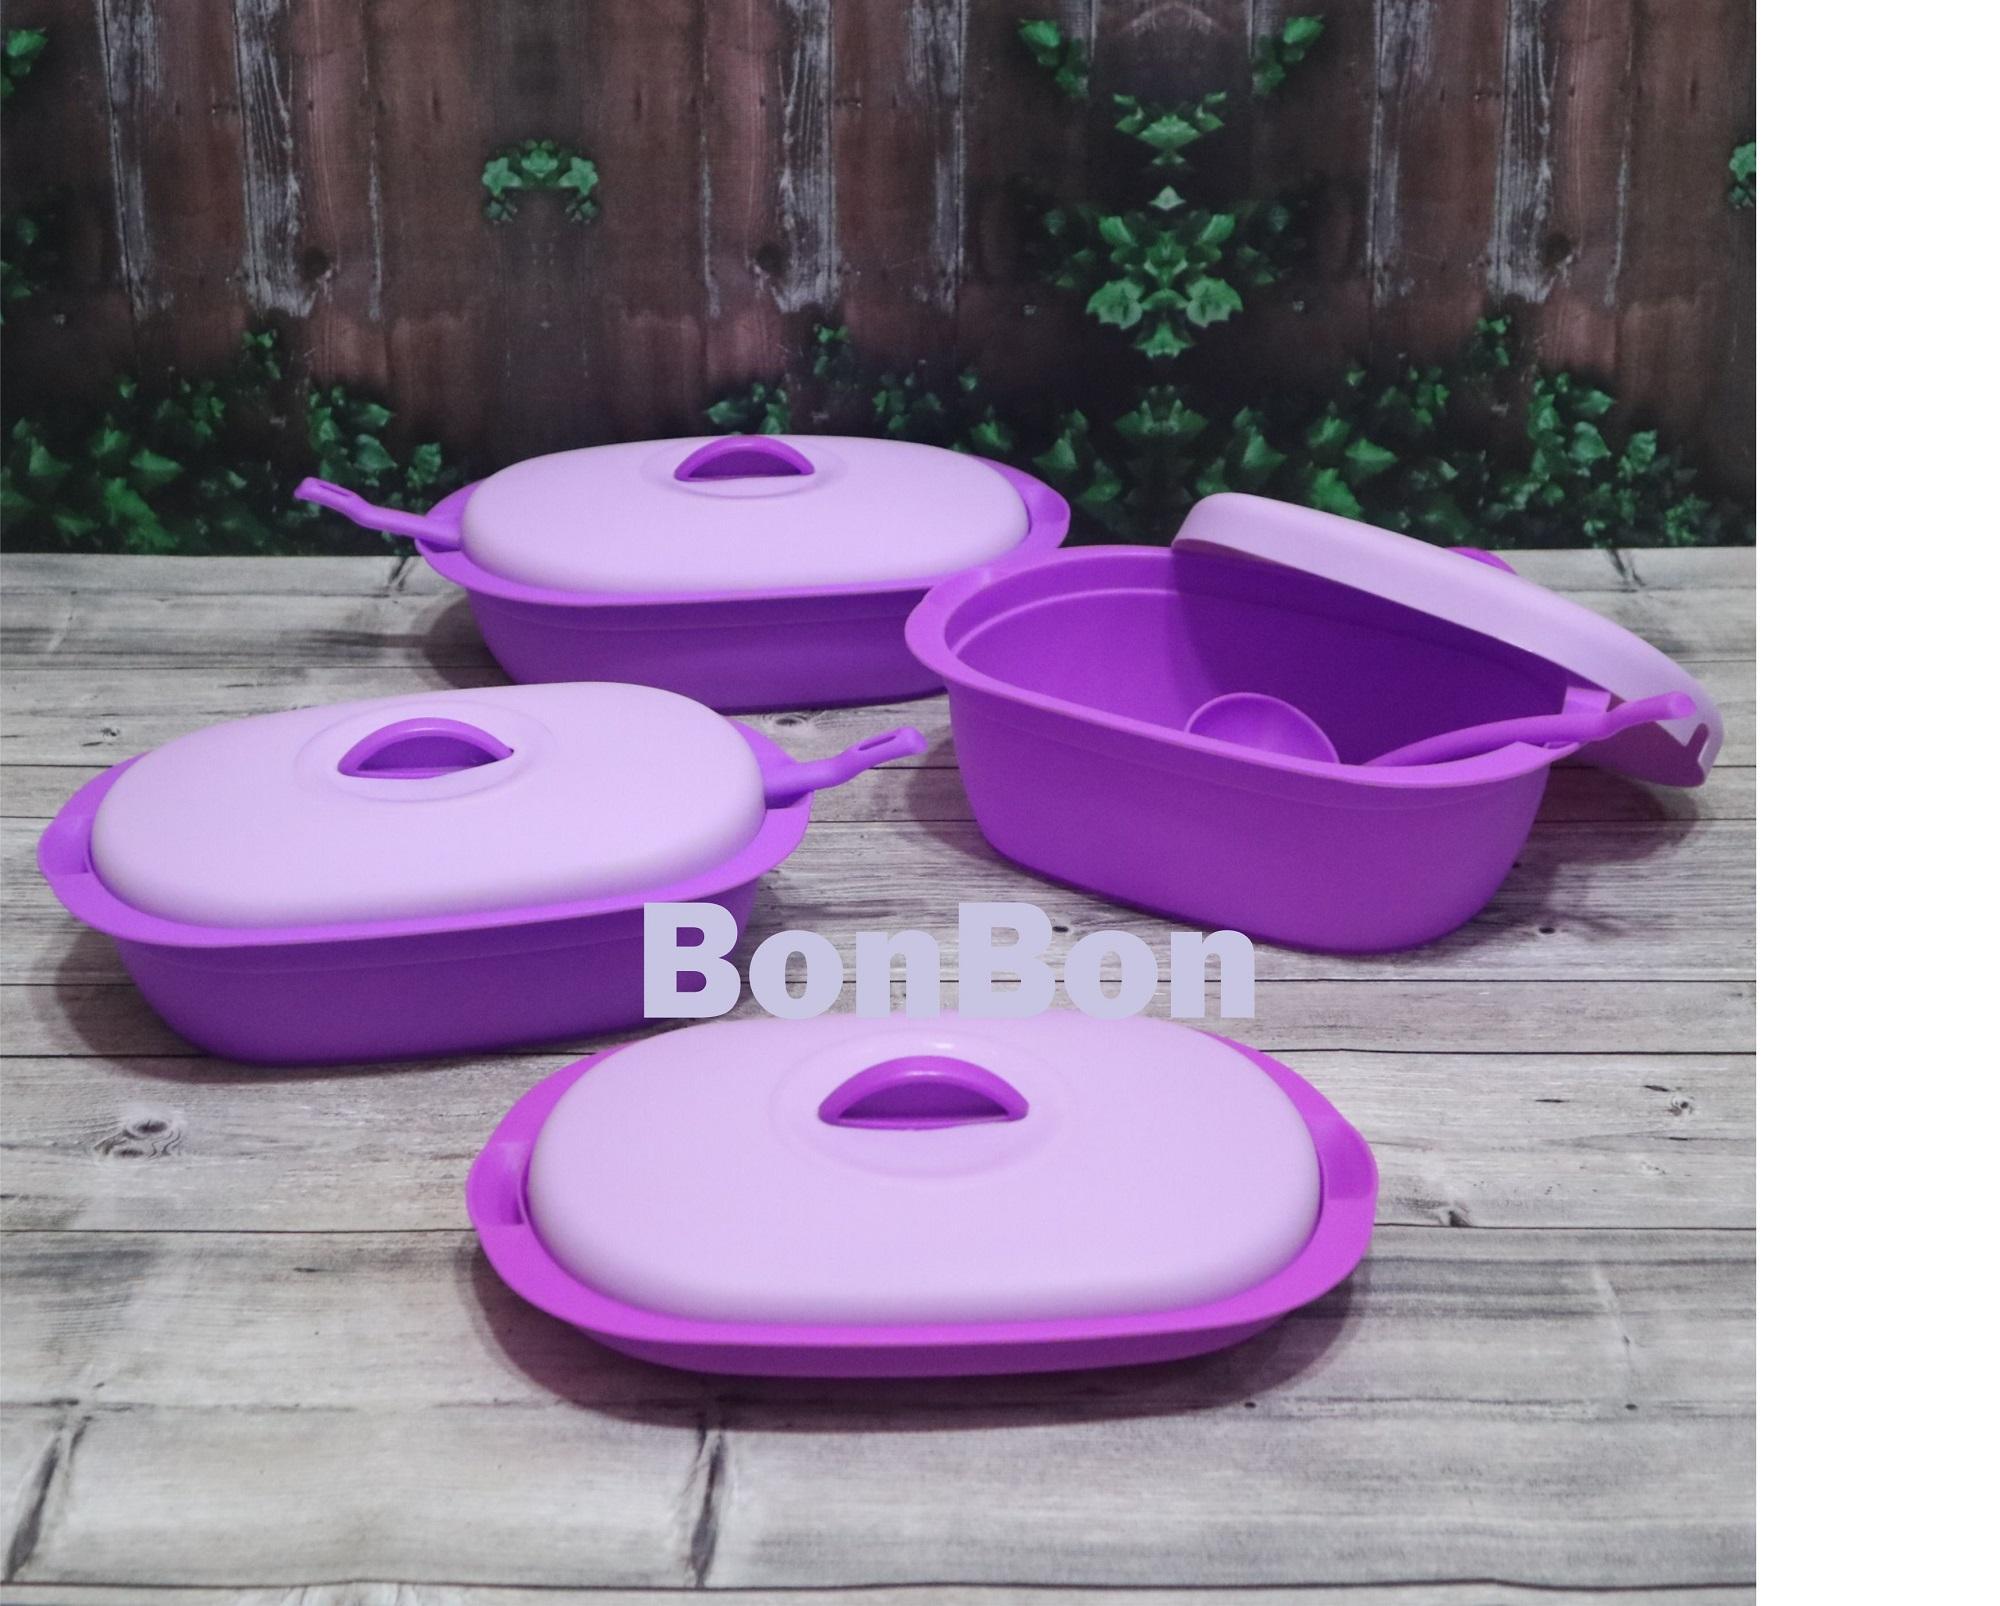 BonBon Wadah Saji Prasmanan Plastik Verona 4 Pcs + 3 Centong Ungu